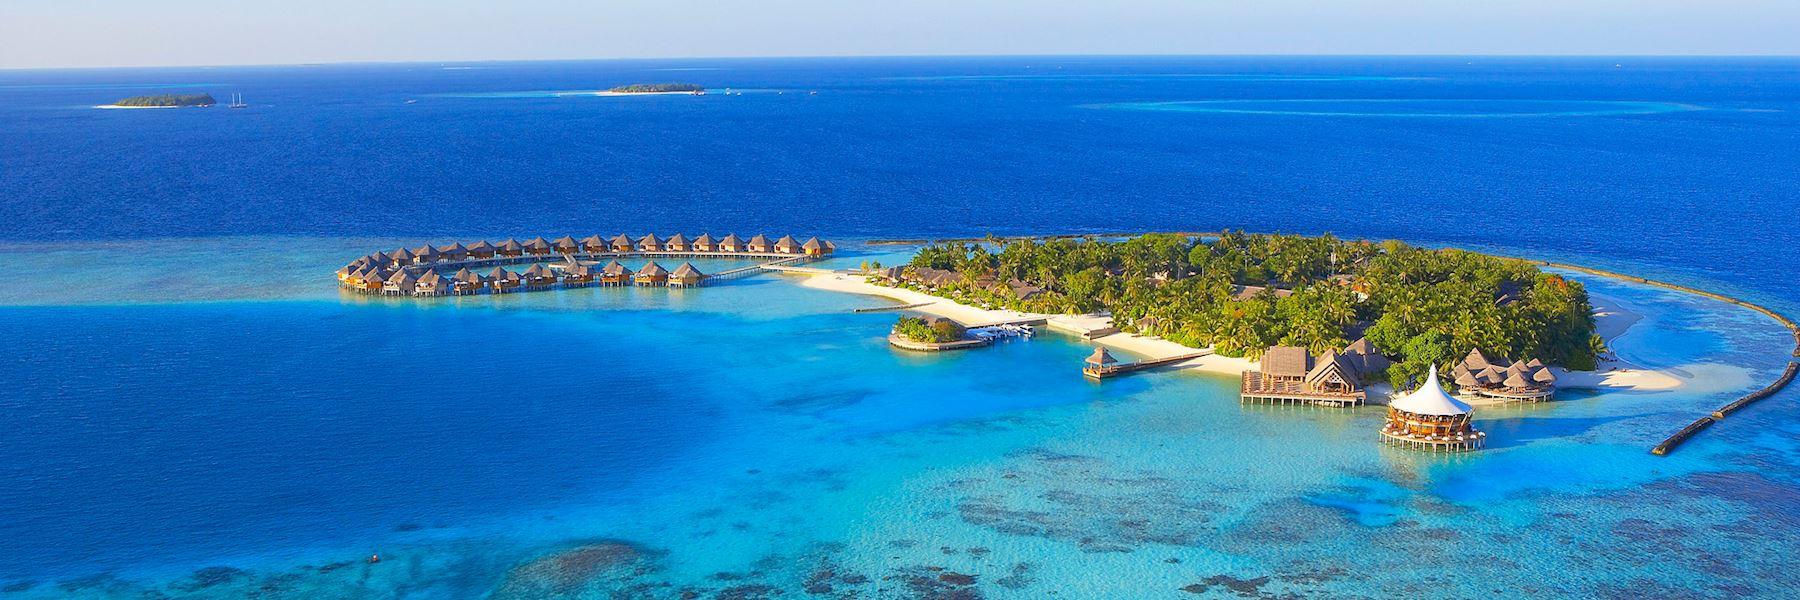 Maldives travel guides